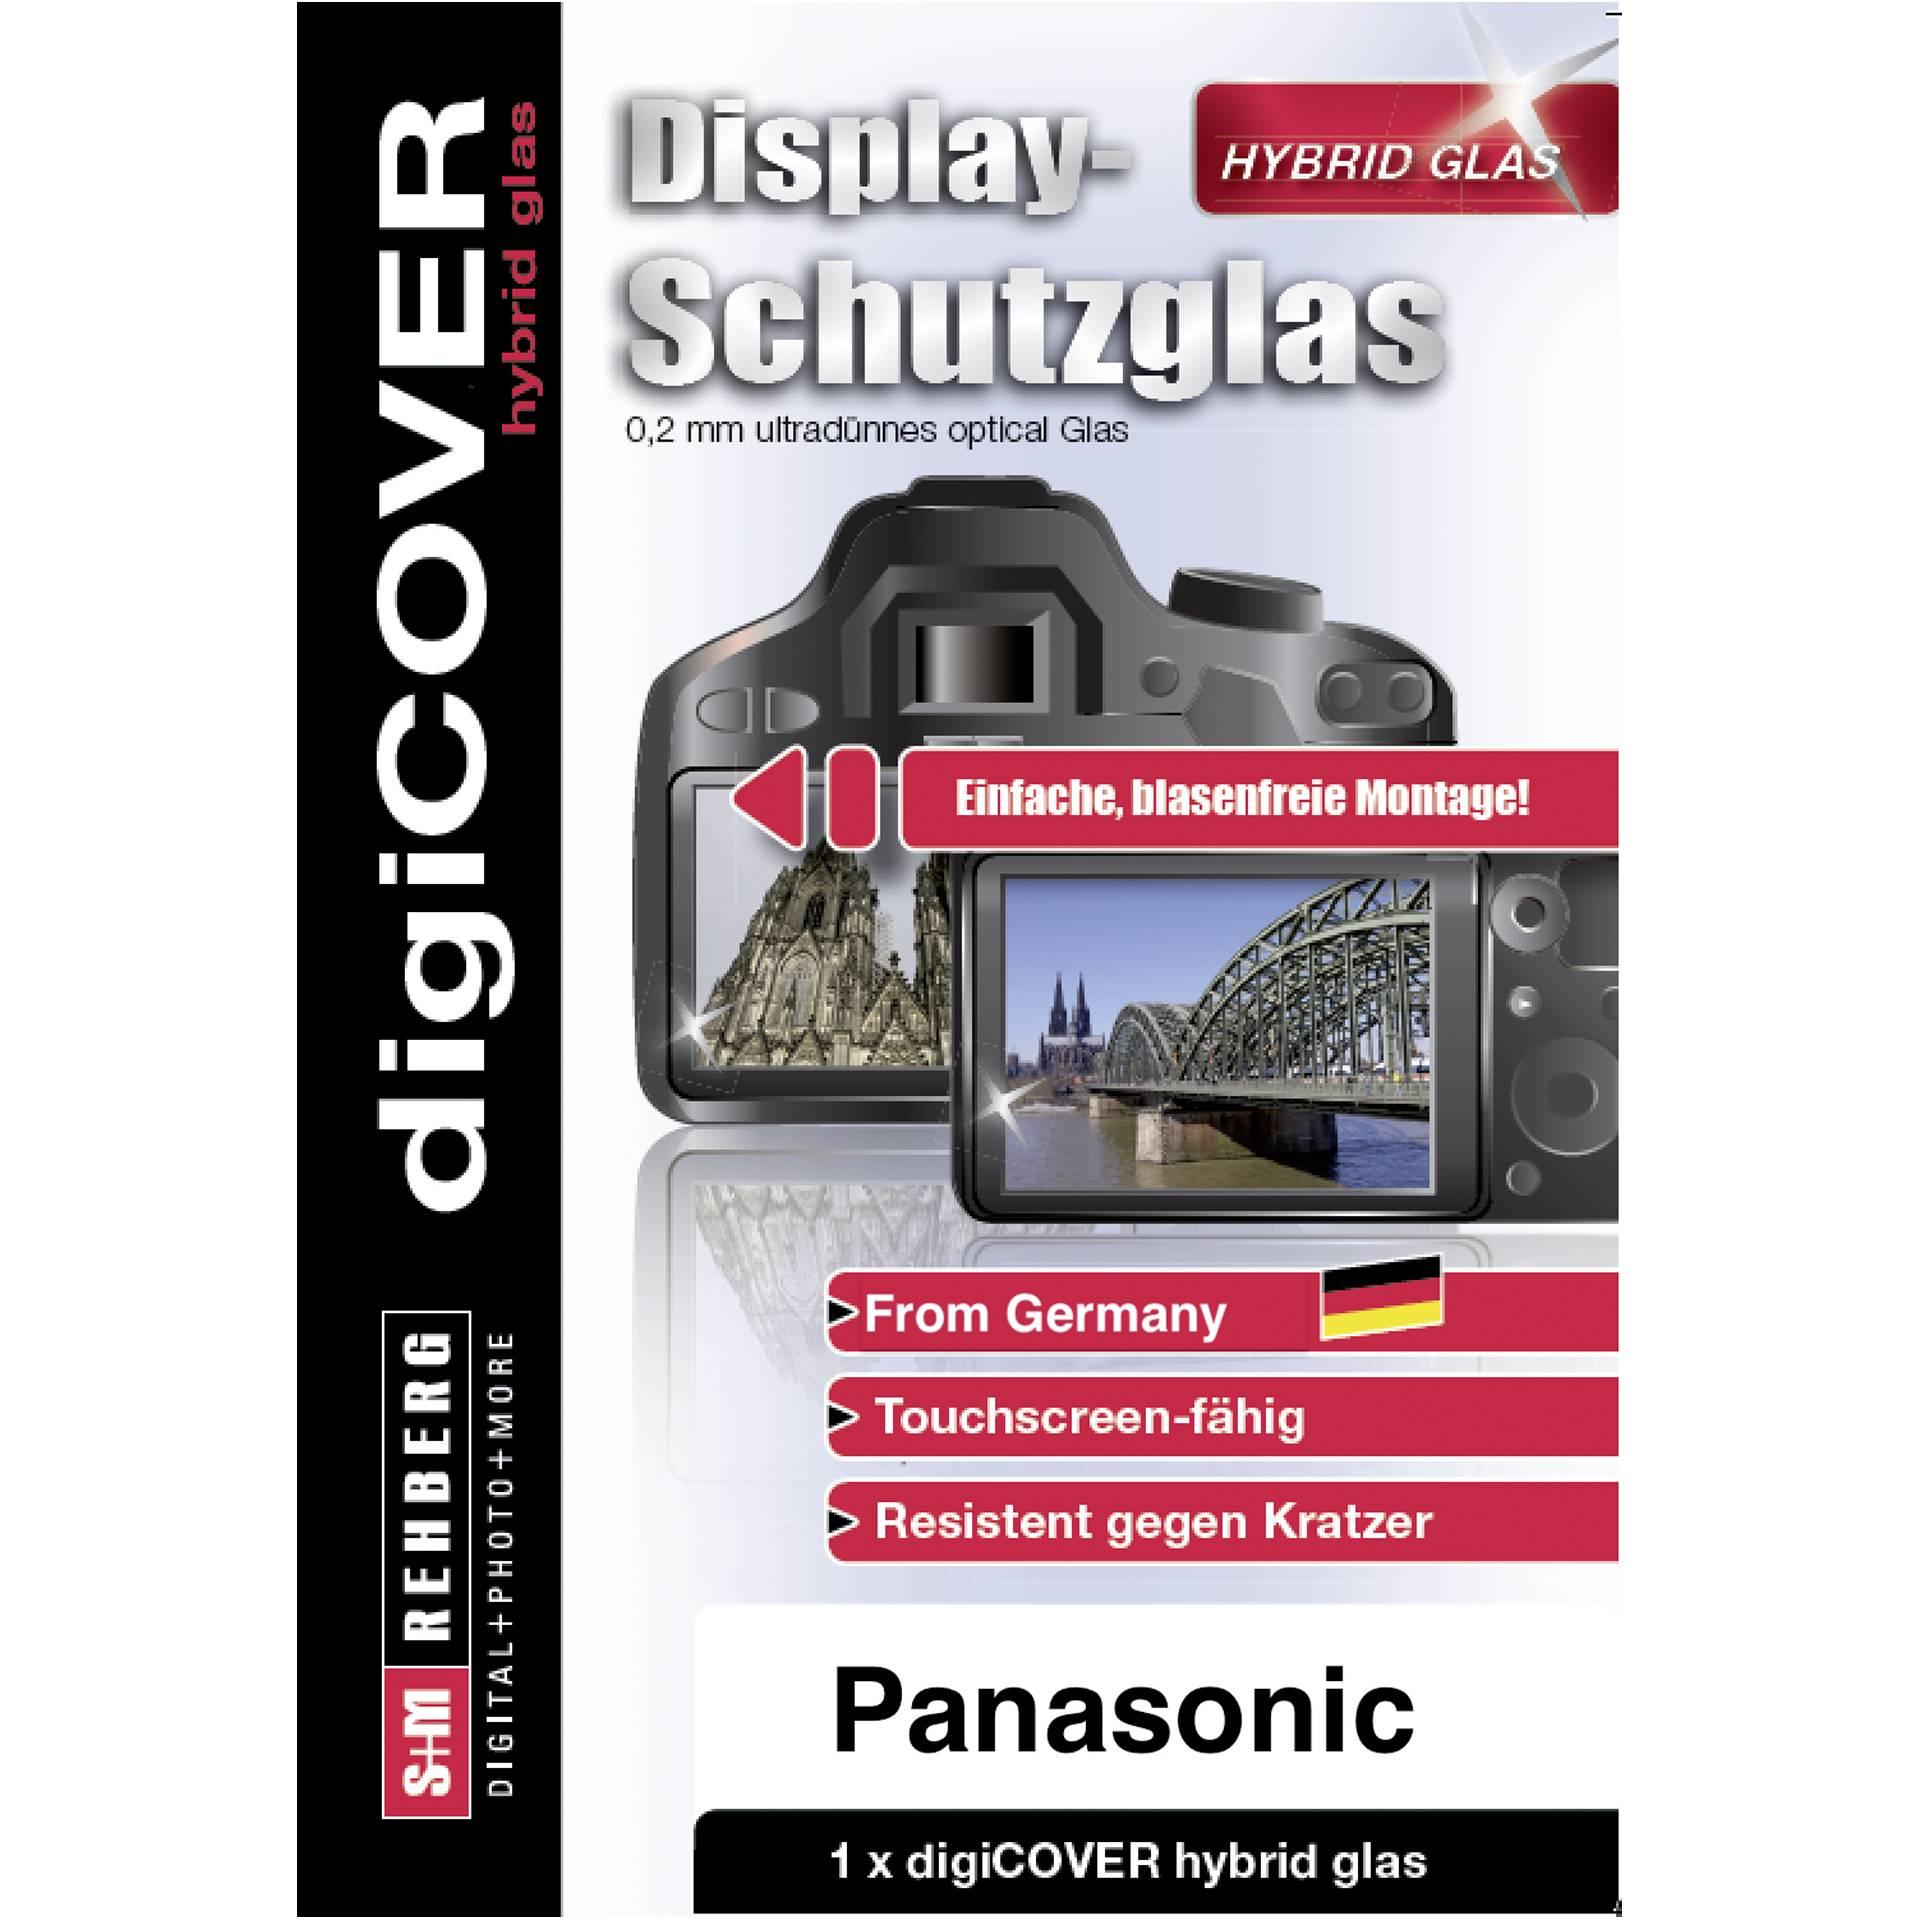 DigiCOVER Hybrid Glass Display Cover Panasonic G110